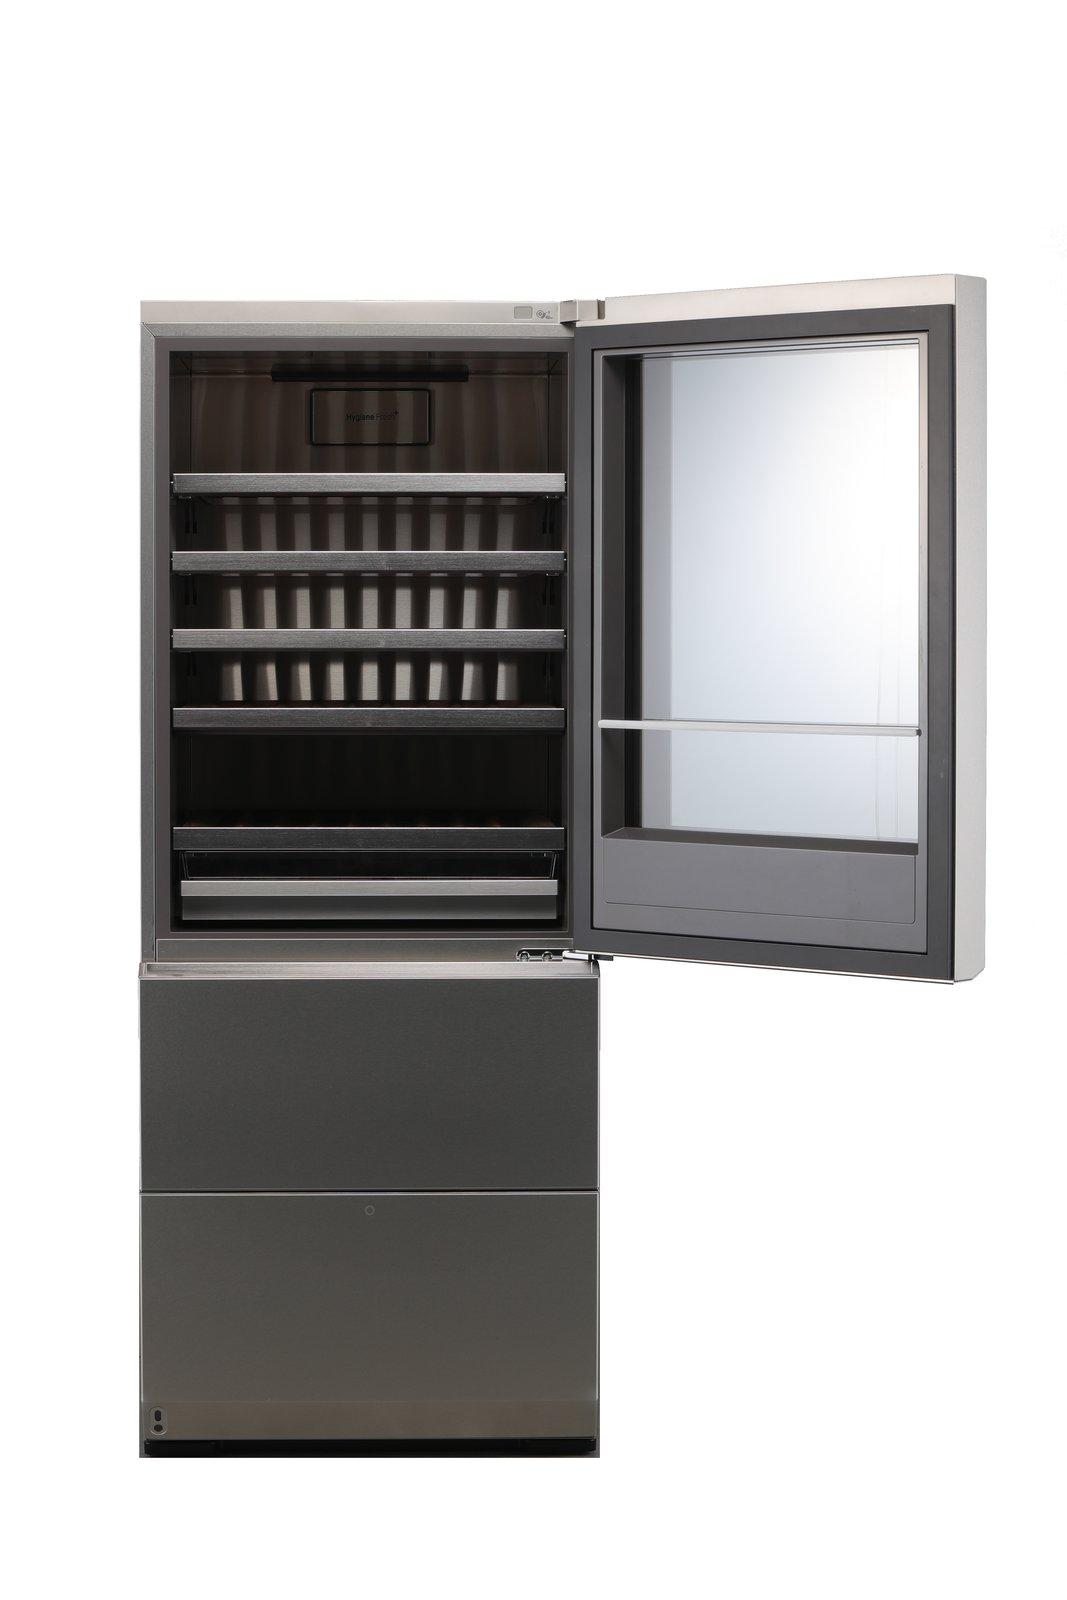 LG Signature smart home appliance kitchen